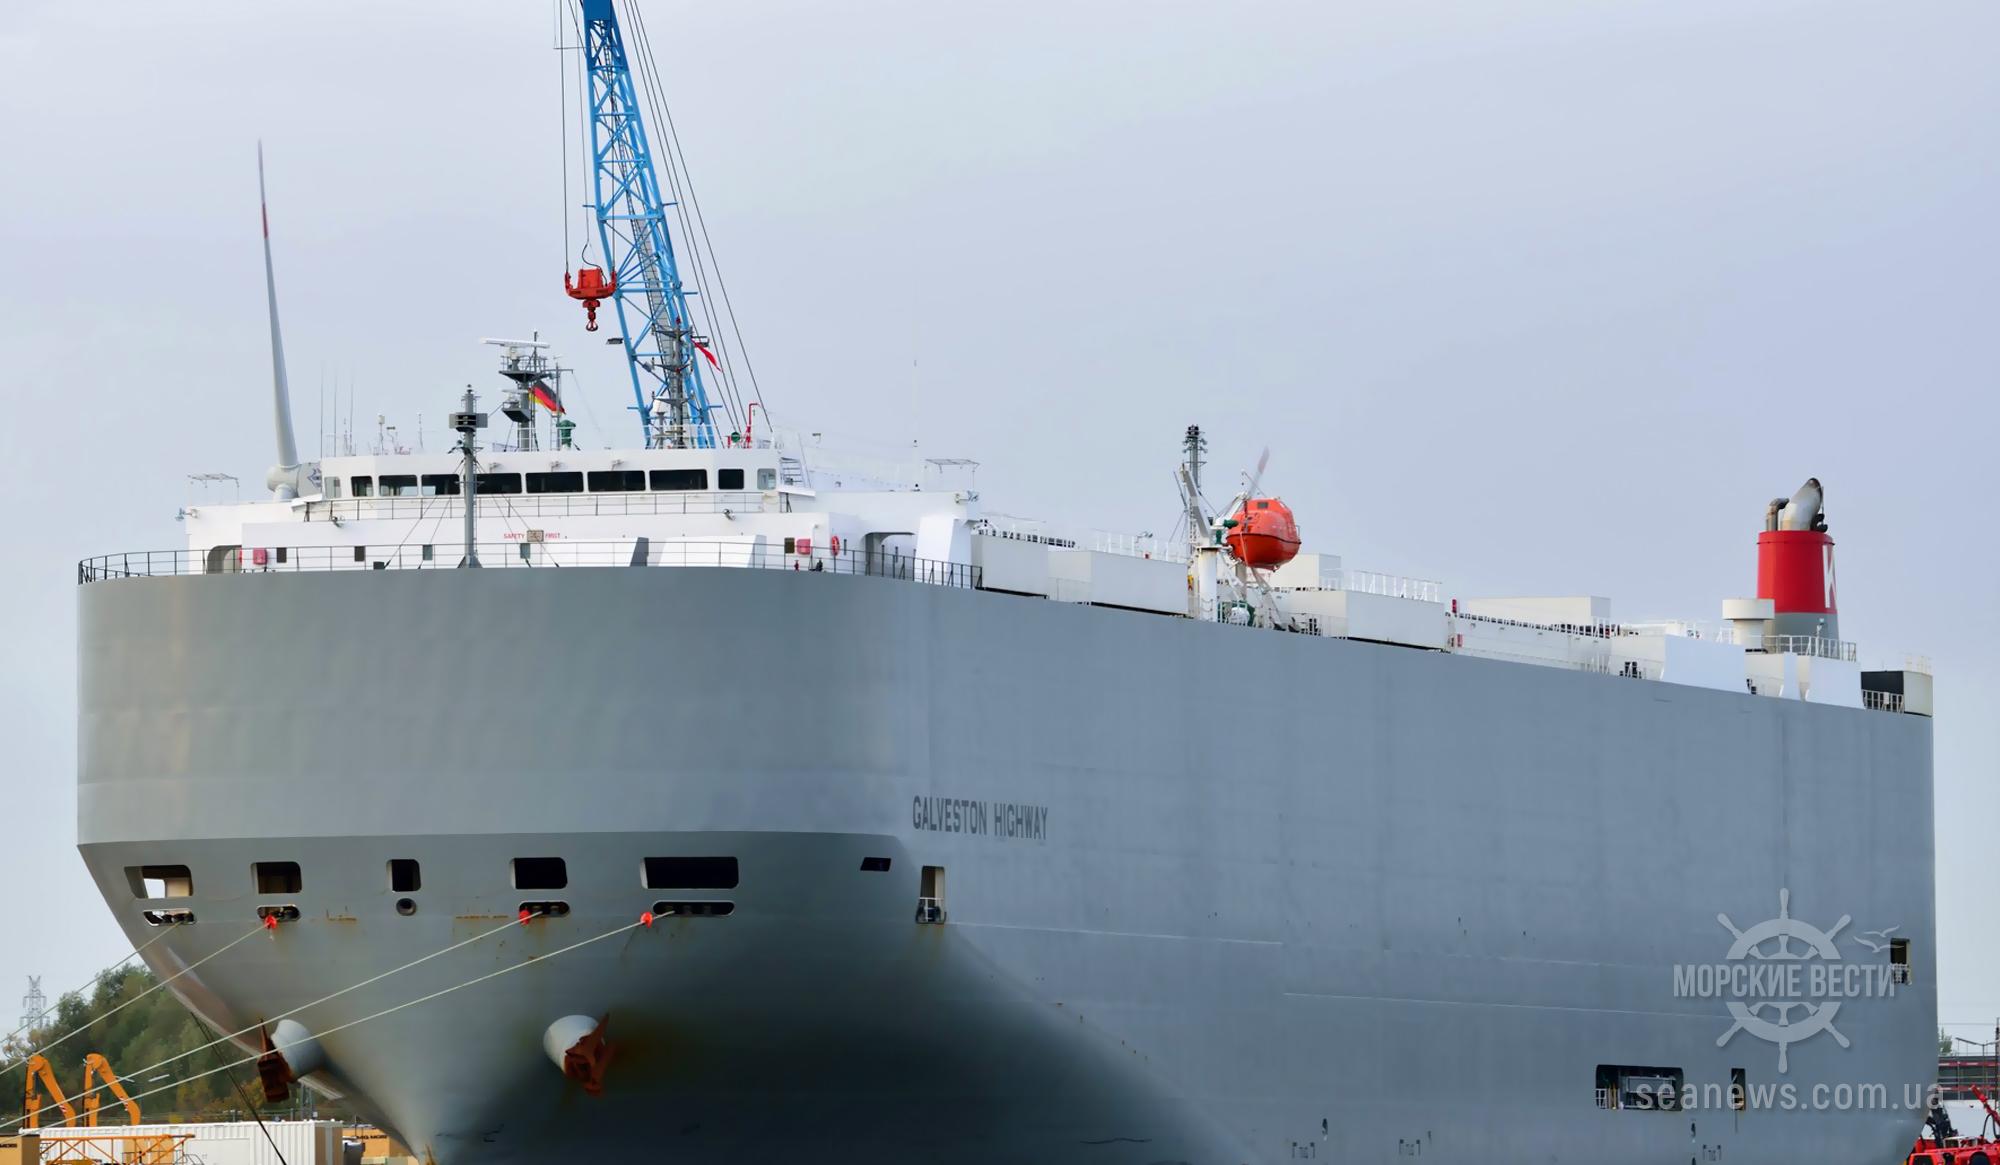 На судно Galveston Highway напали грабители